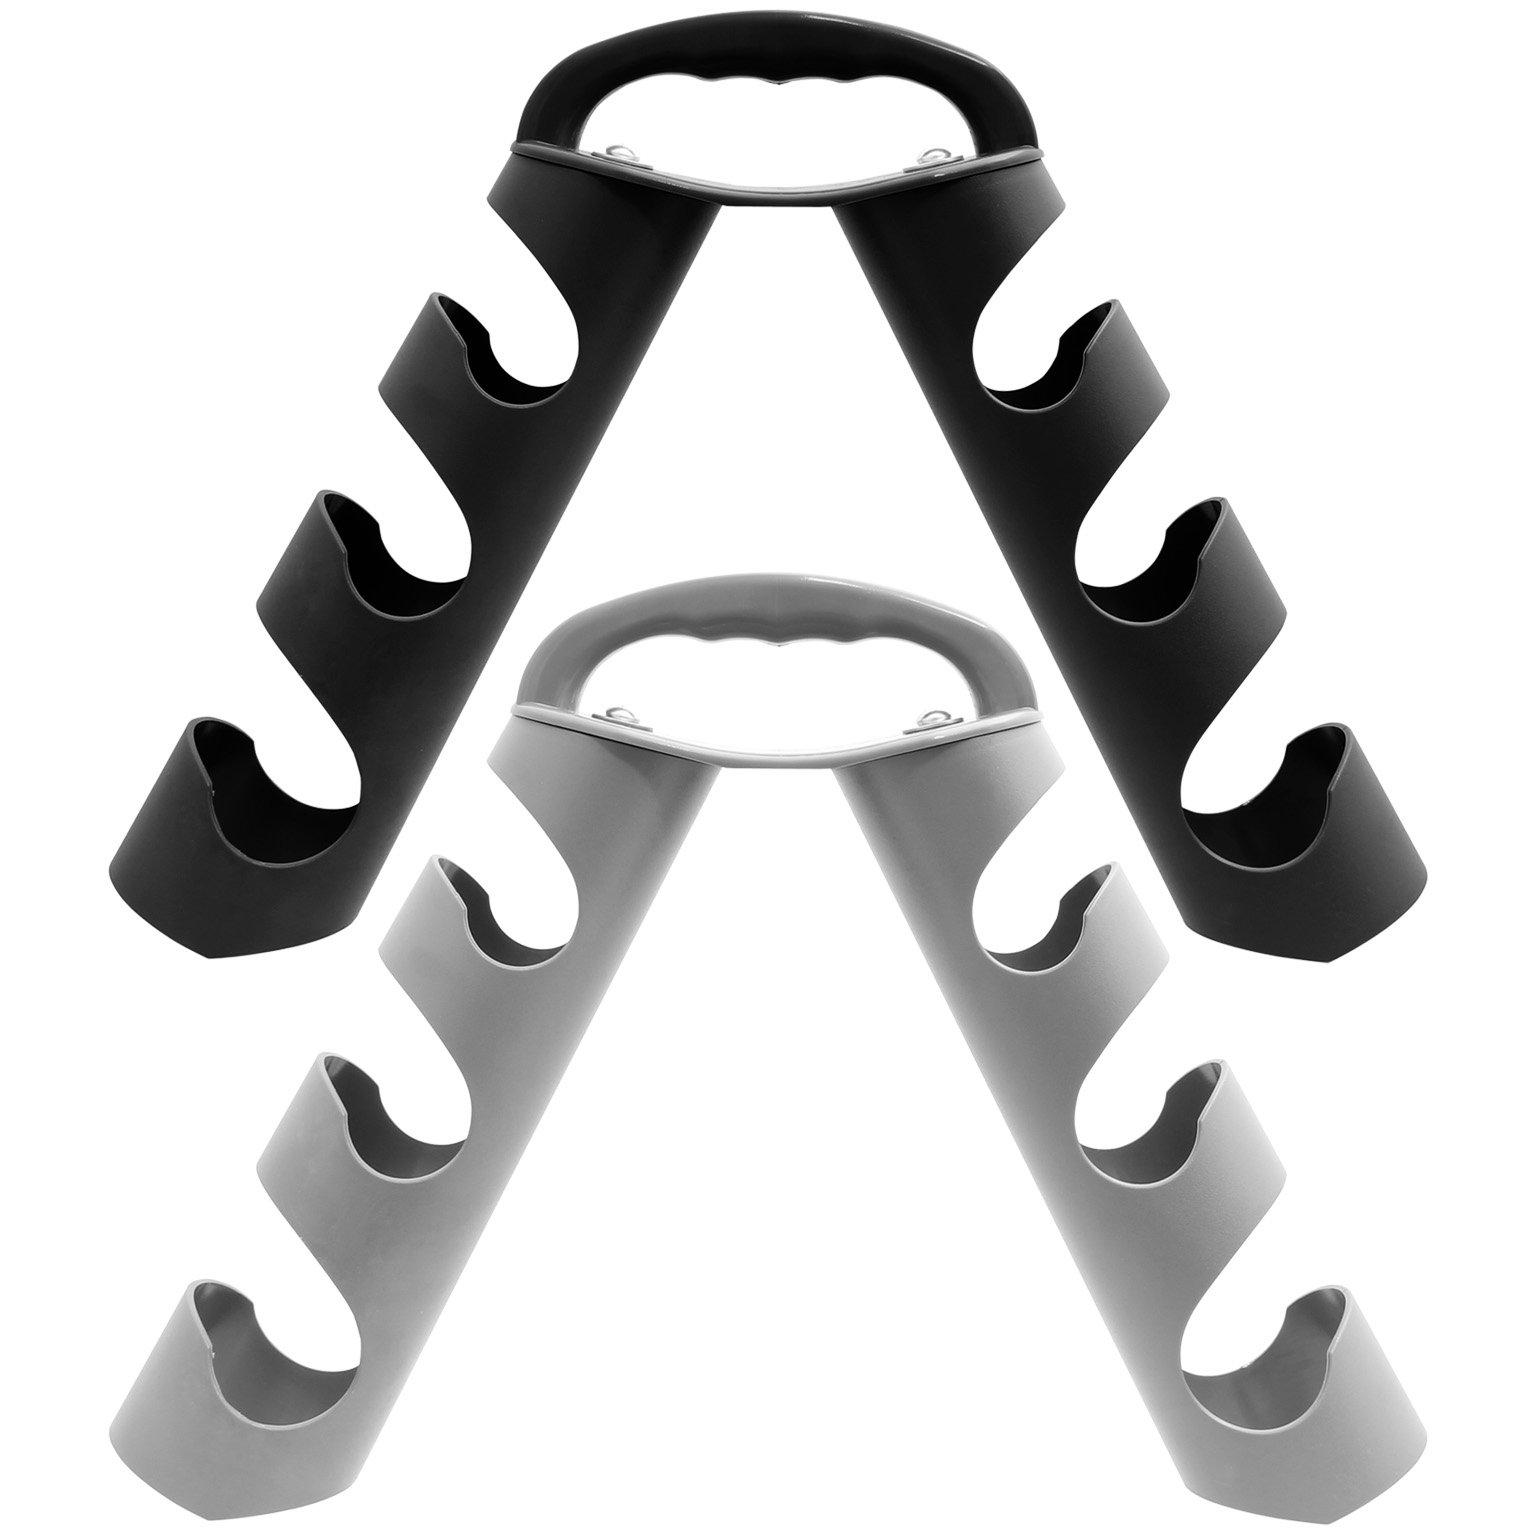 MiraFit - Rastrelliera portatile porta manubri - vari colori (pesi non inclusi)